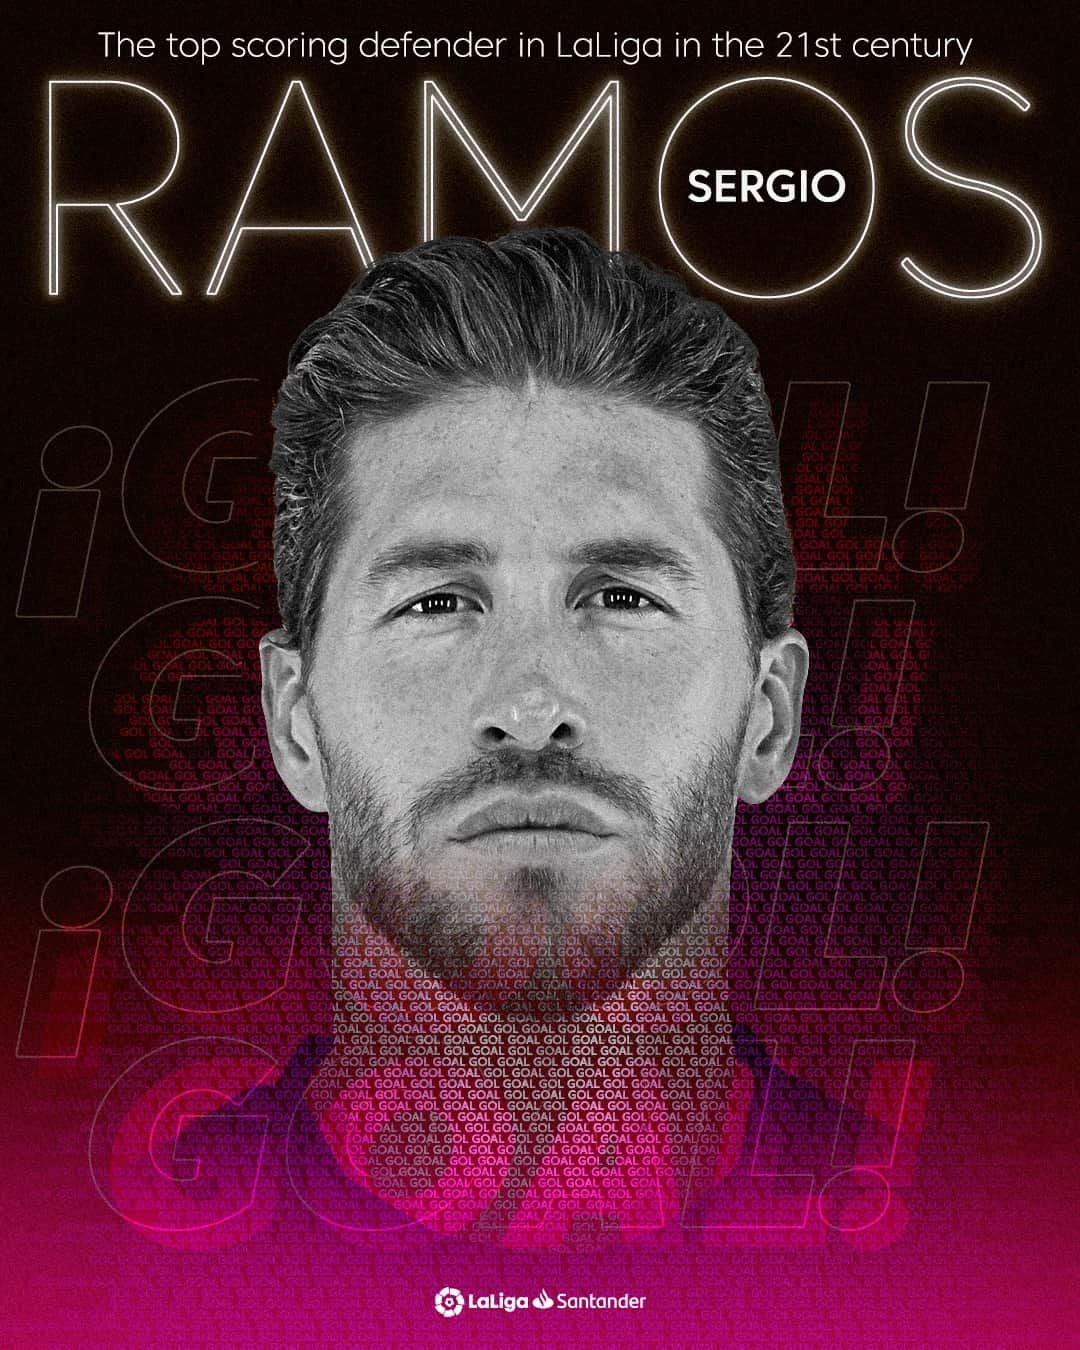 The Top Scoring Defender In Laliga In The 21th Century Sergio Ramos Make History Again Sergio Ramos Real Zaragoza Real Madrid Castilla